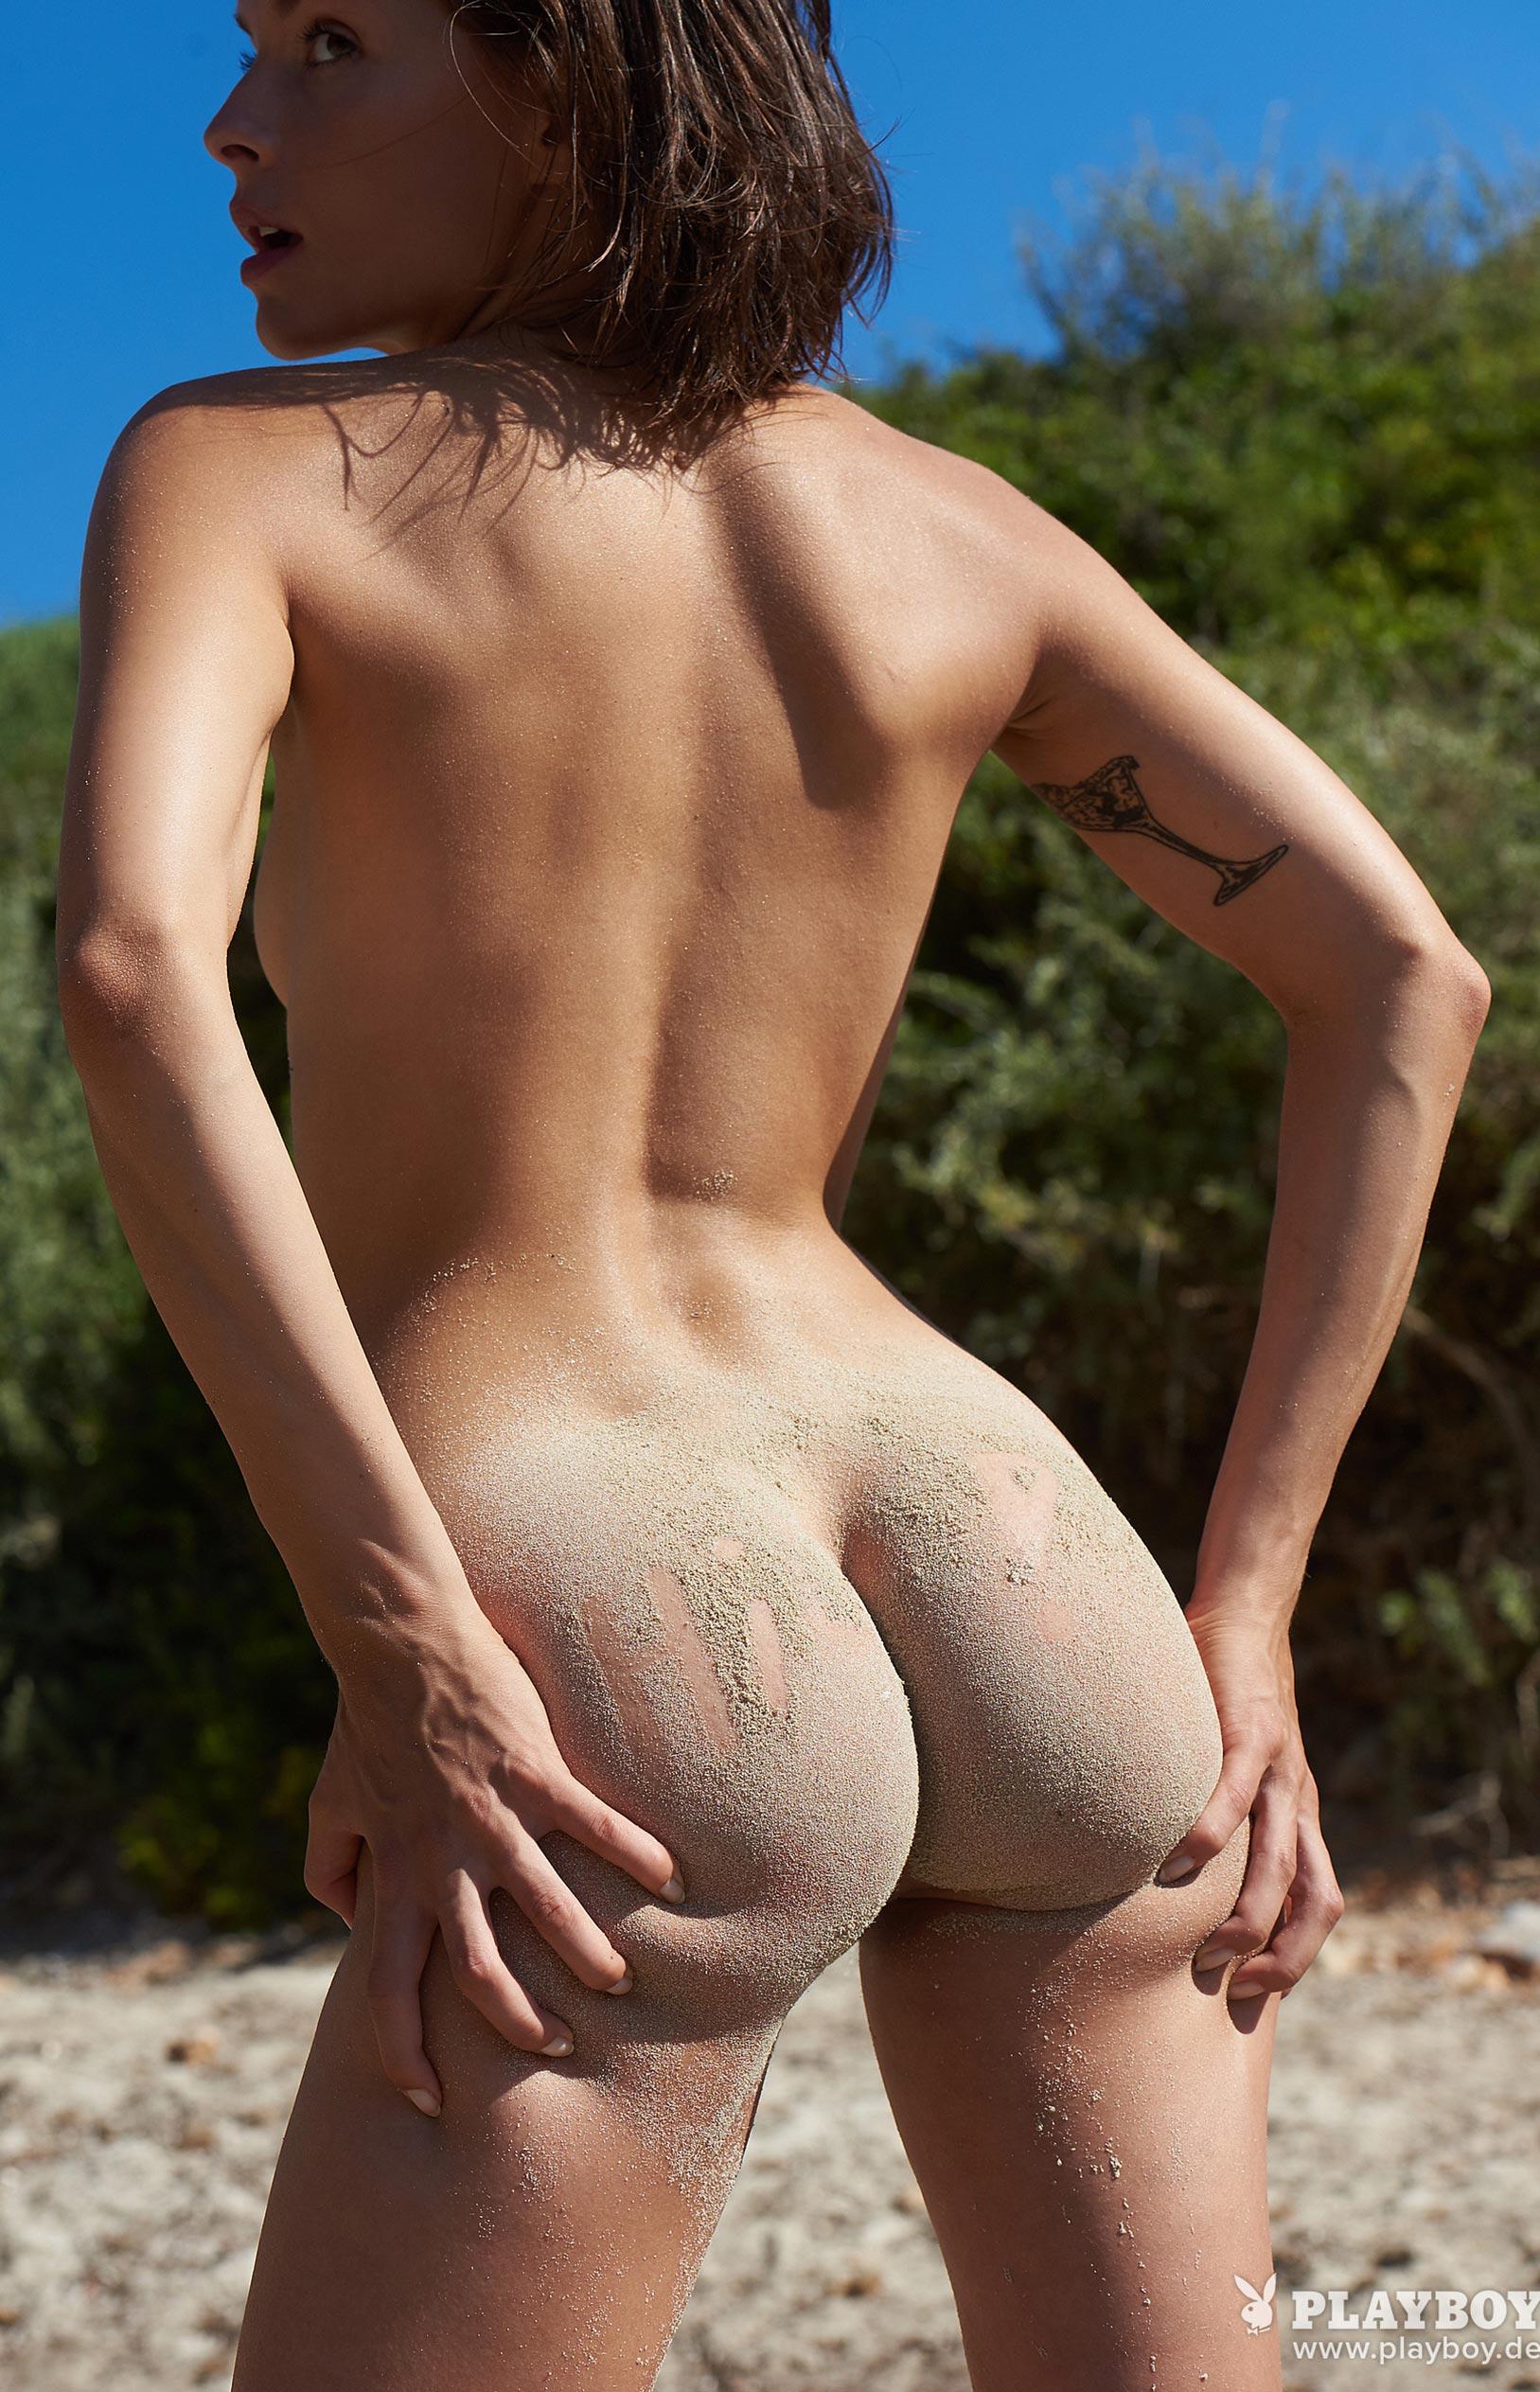 Оливия Пельцер - Девушка месяца Playboy Германия, сентябрь 2018 / фото 23